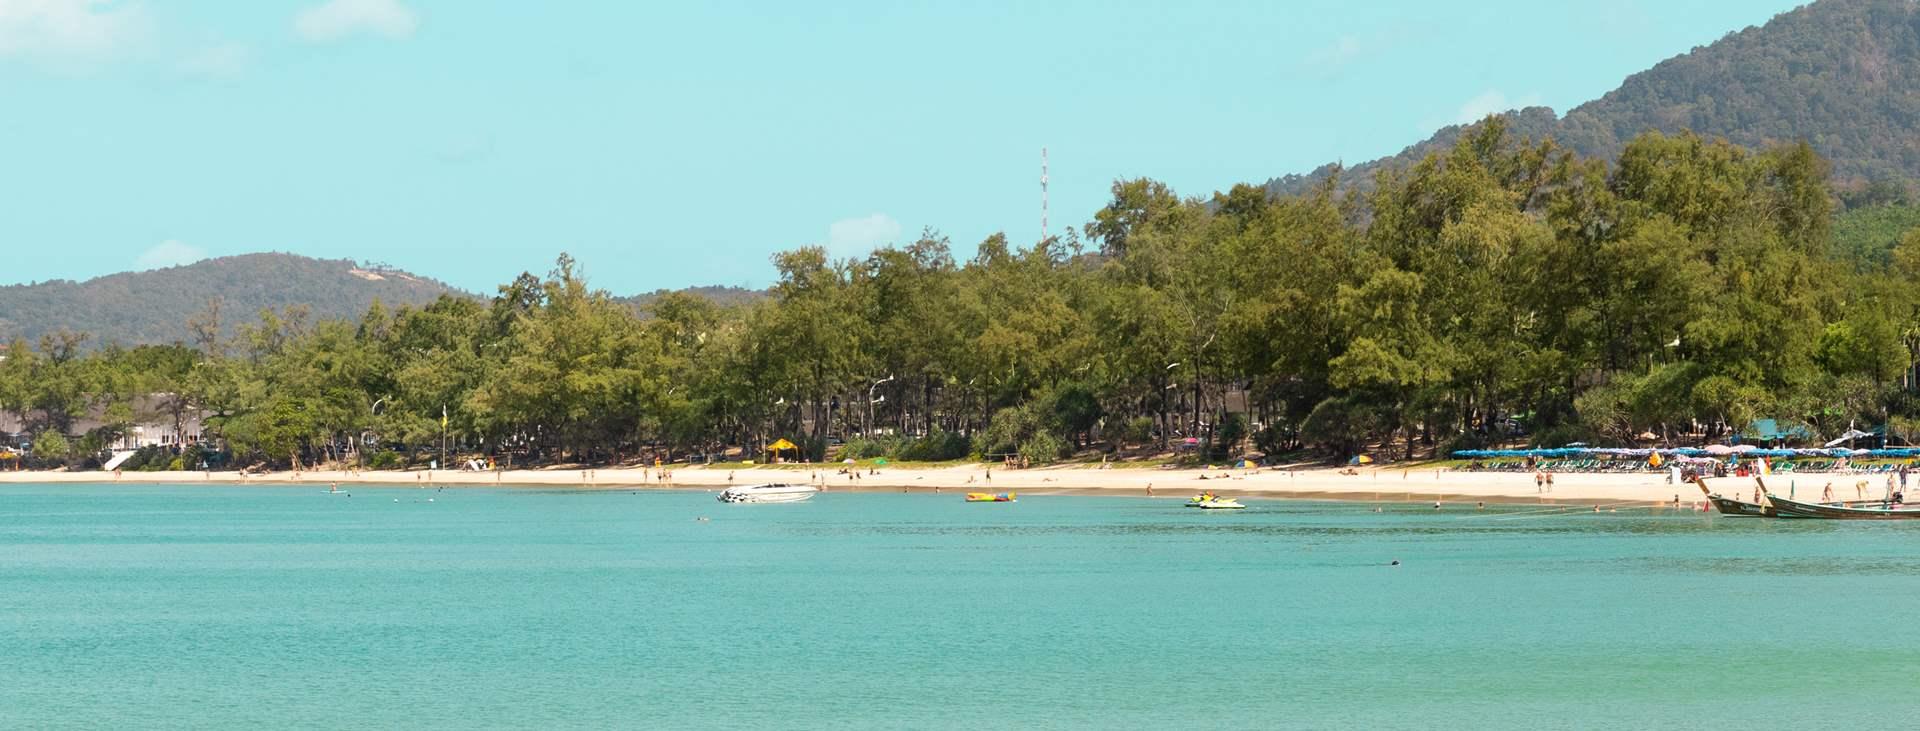 Resor till Kata Beach i Thailand